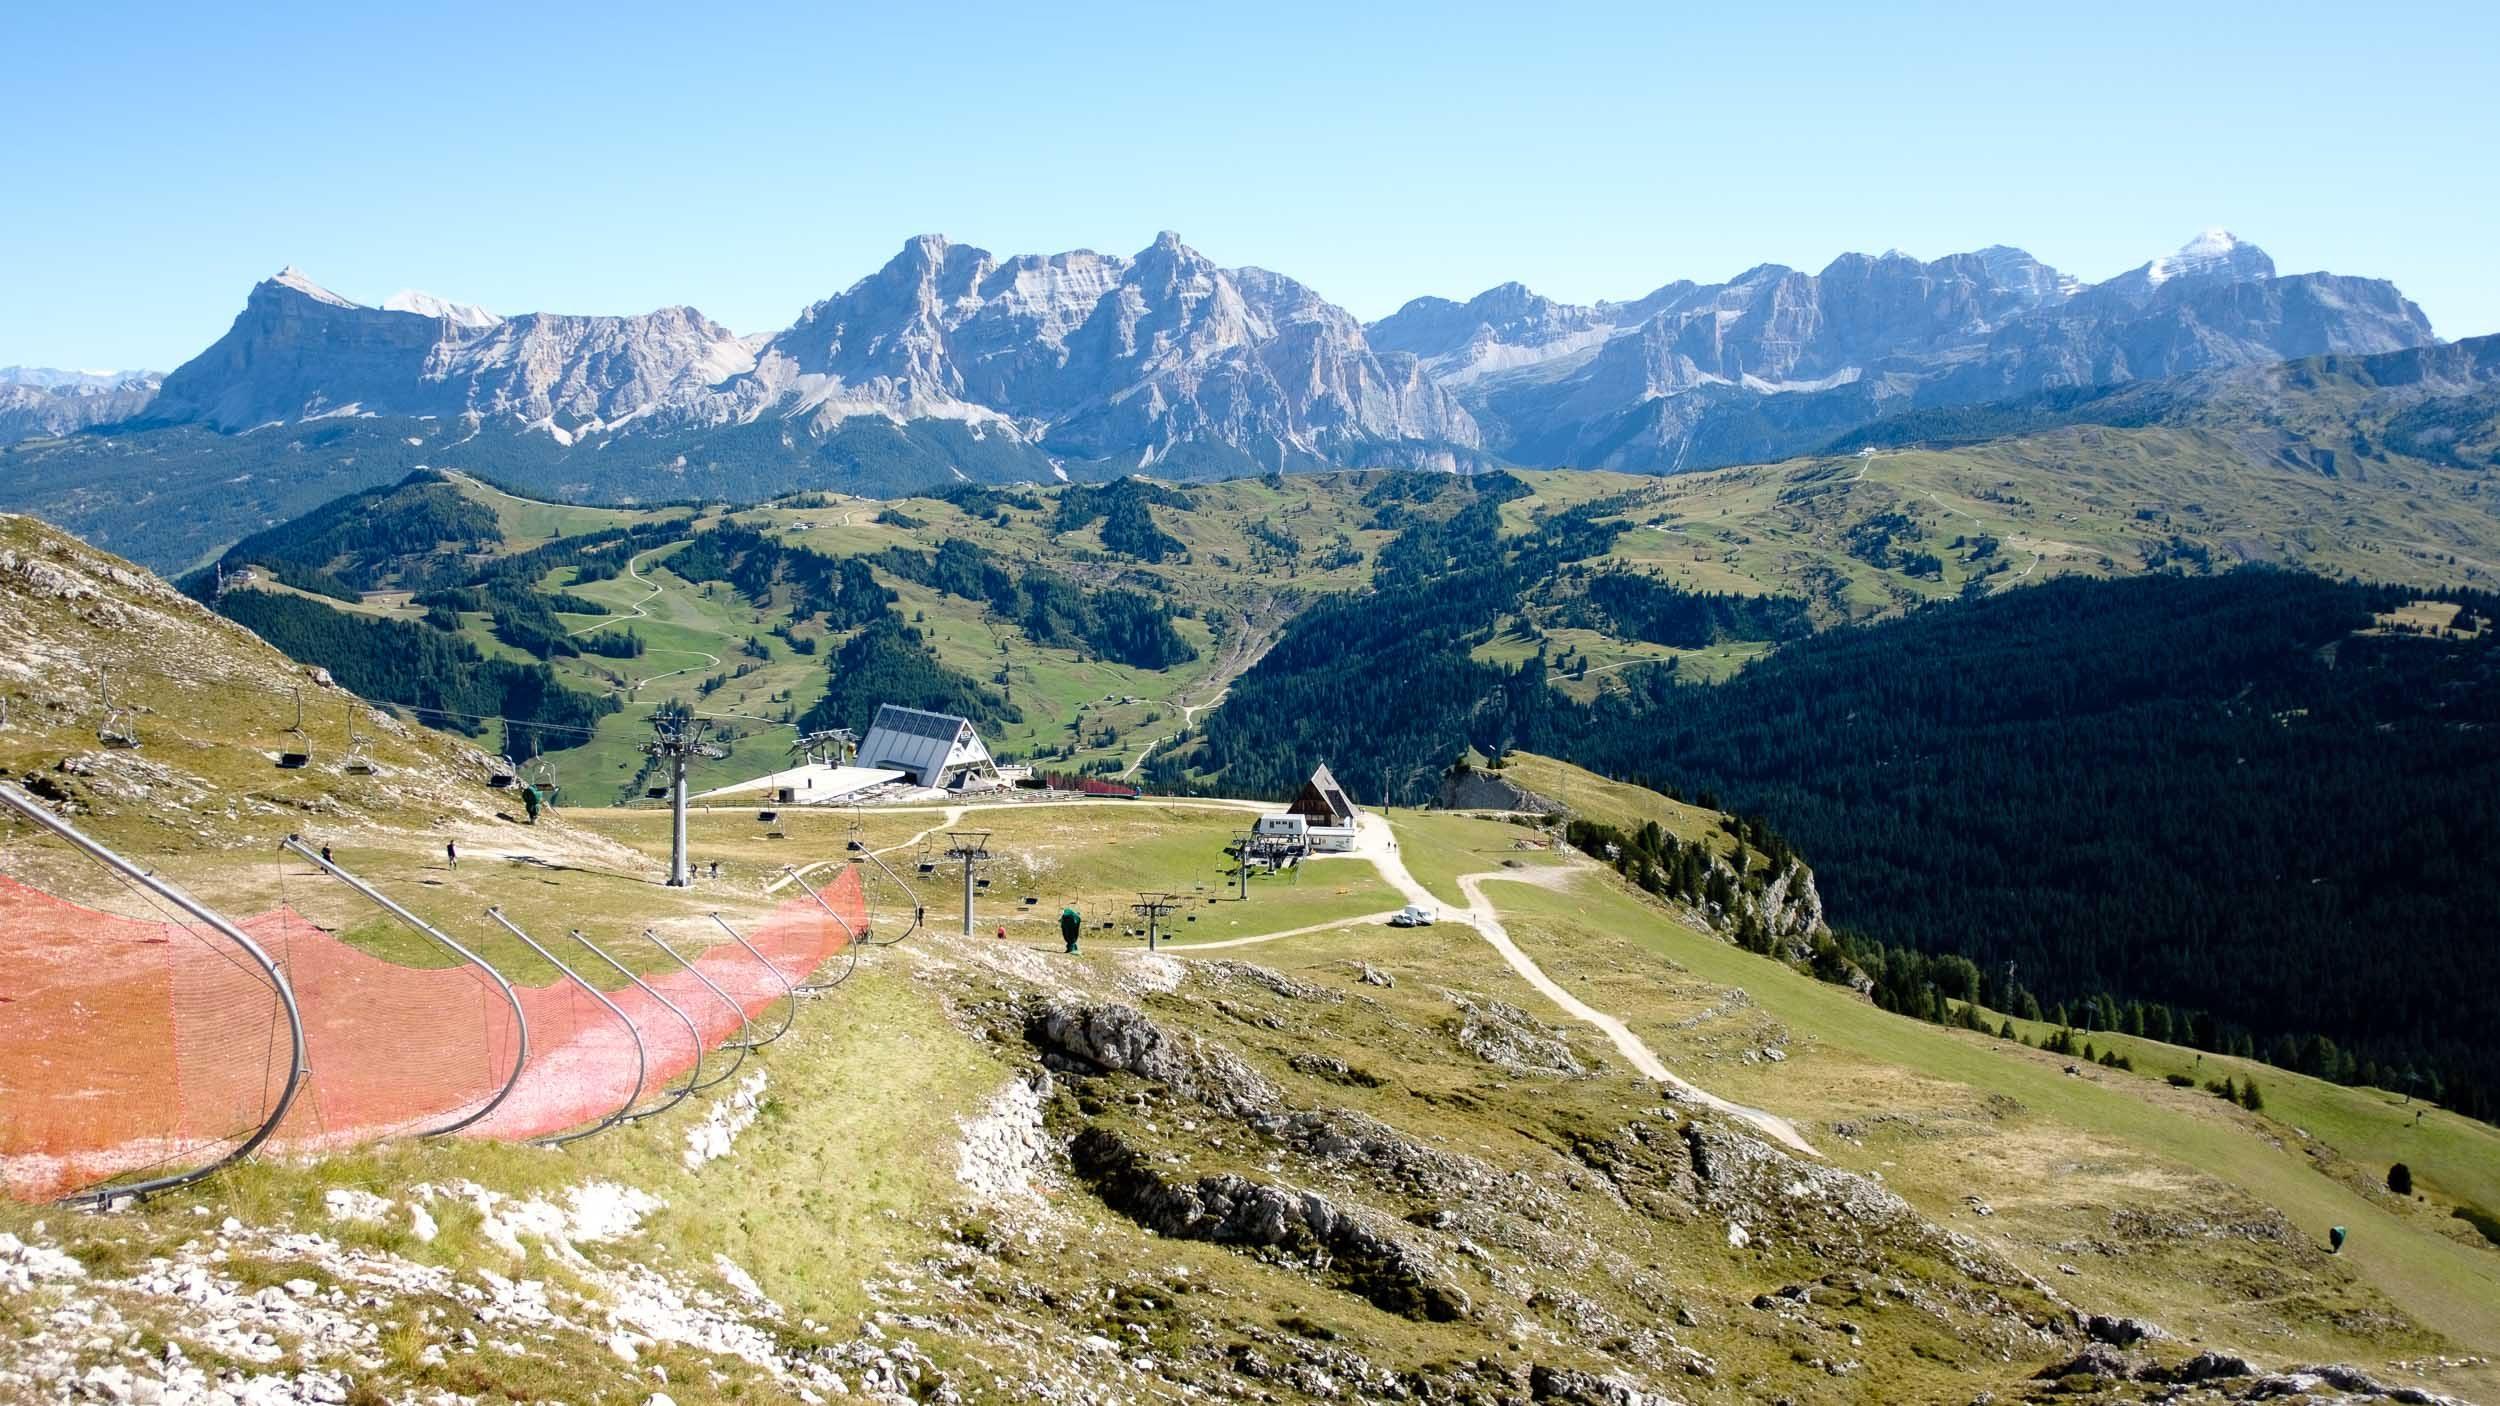 Bergstation Boé, Naturpark Fanes-Sennes-Prags